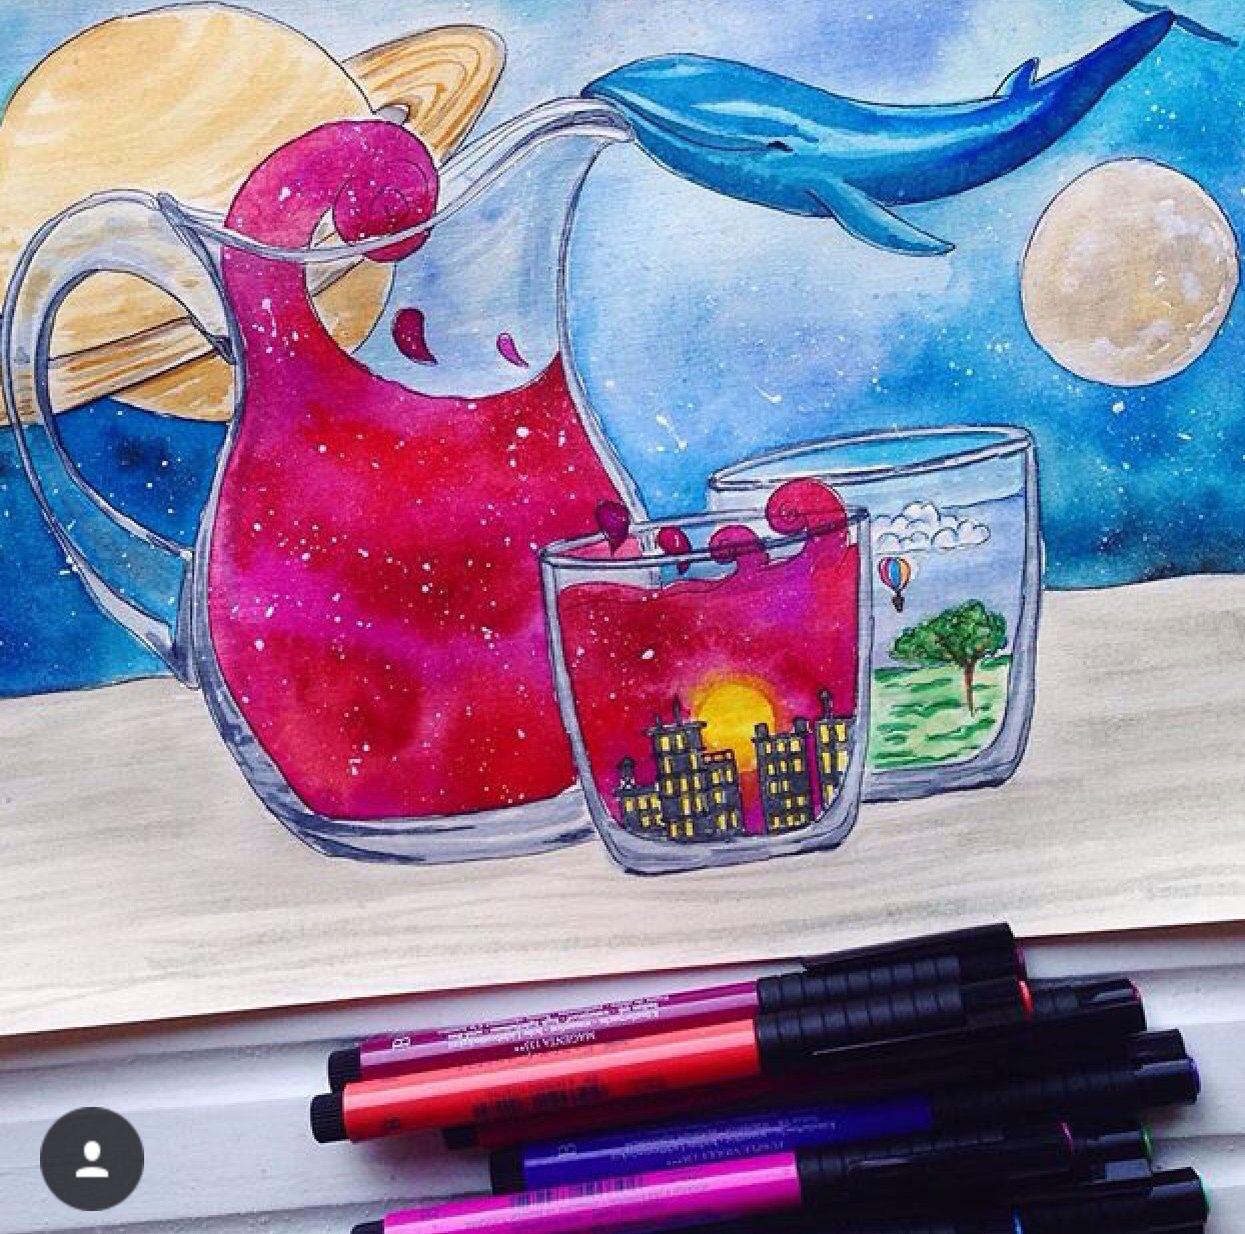 @happiestsim on Instagram